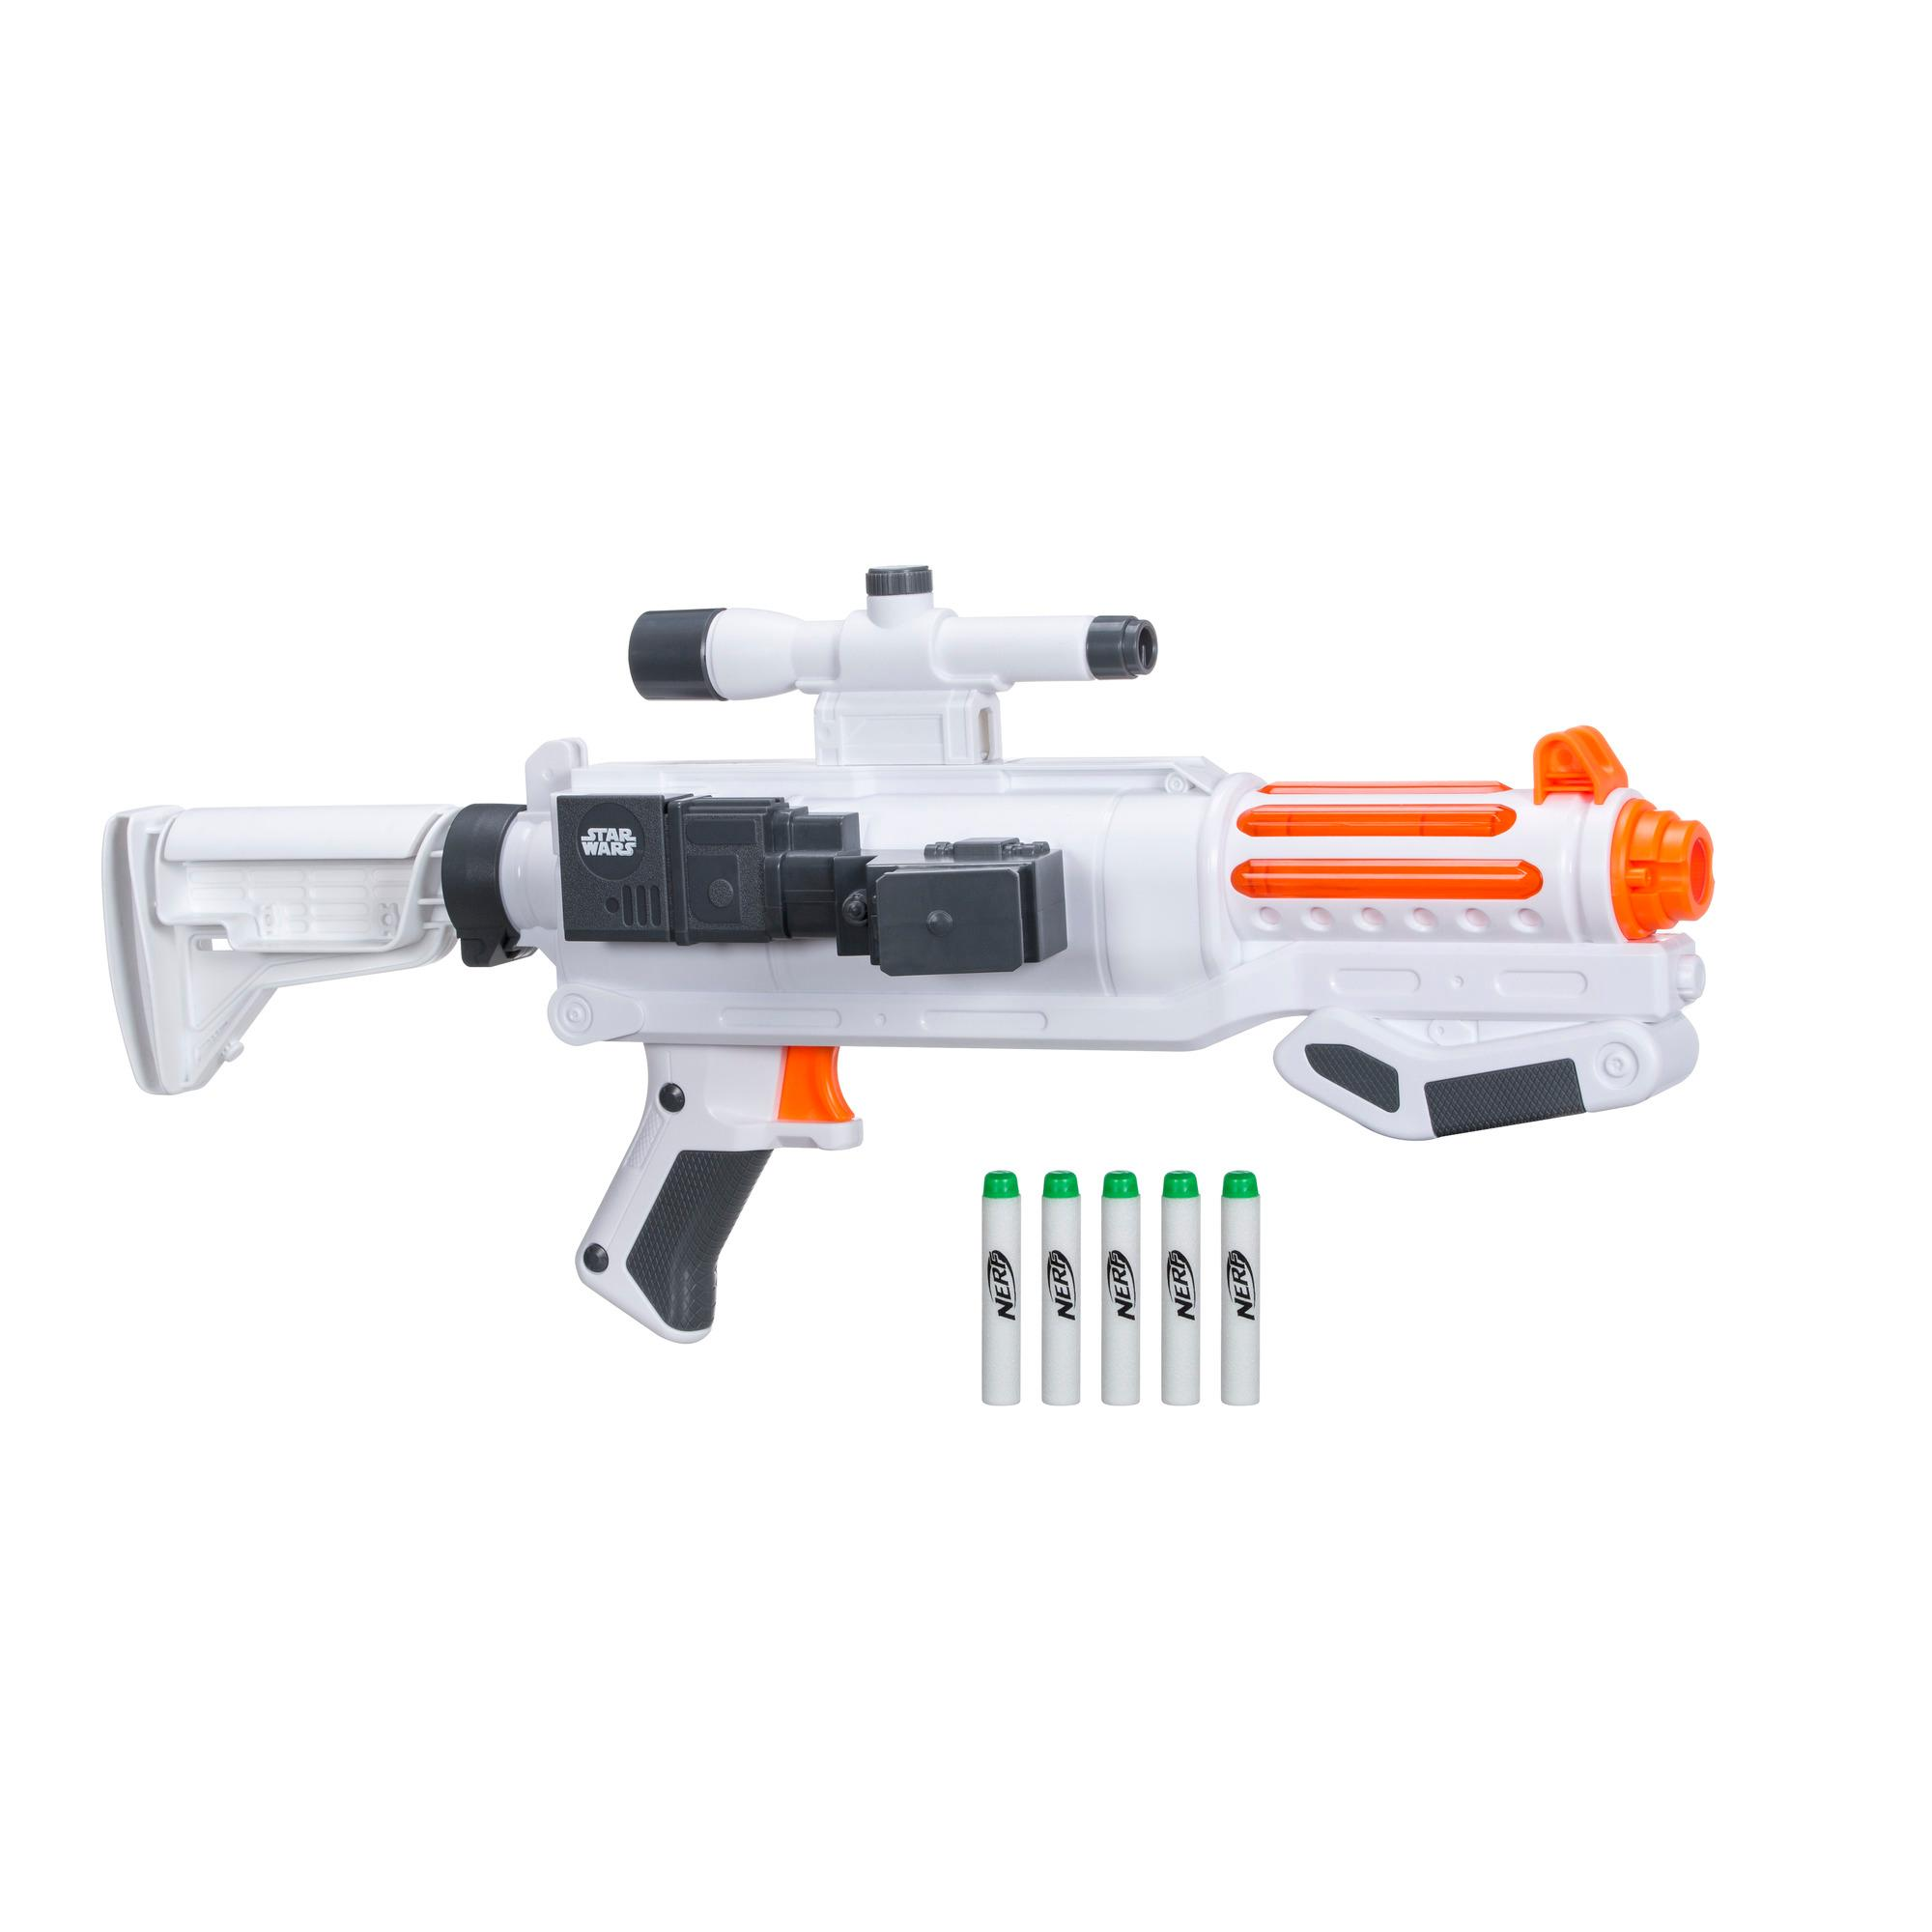 Star Wars Nerf Captain Phasma Blaster